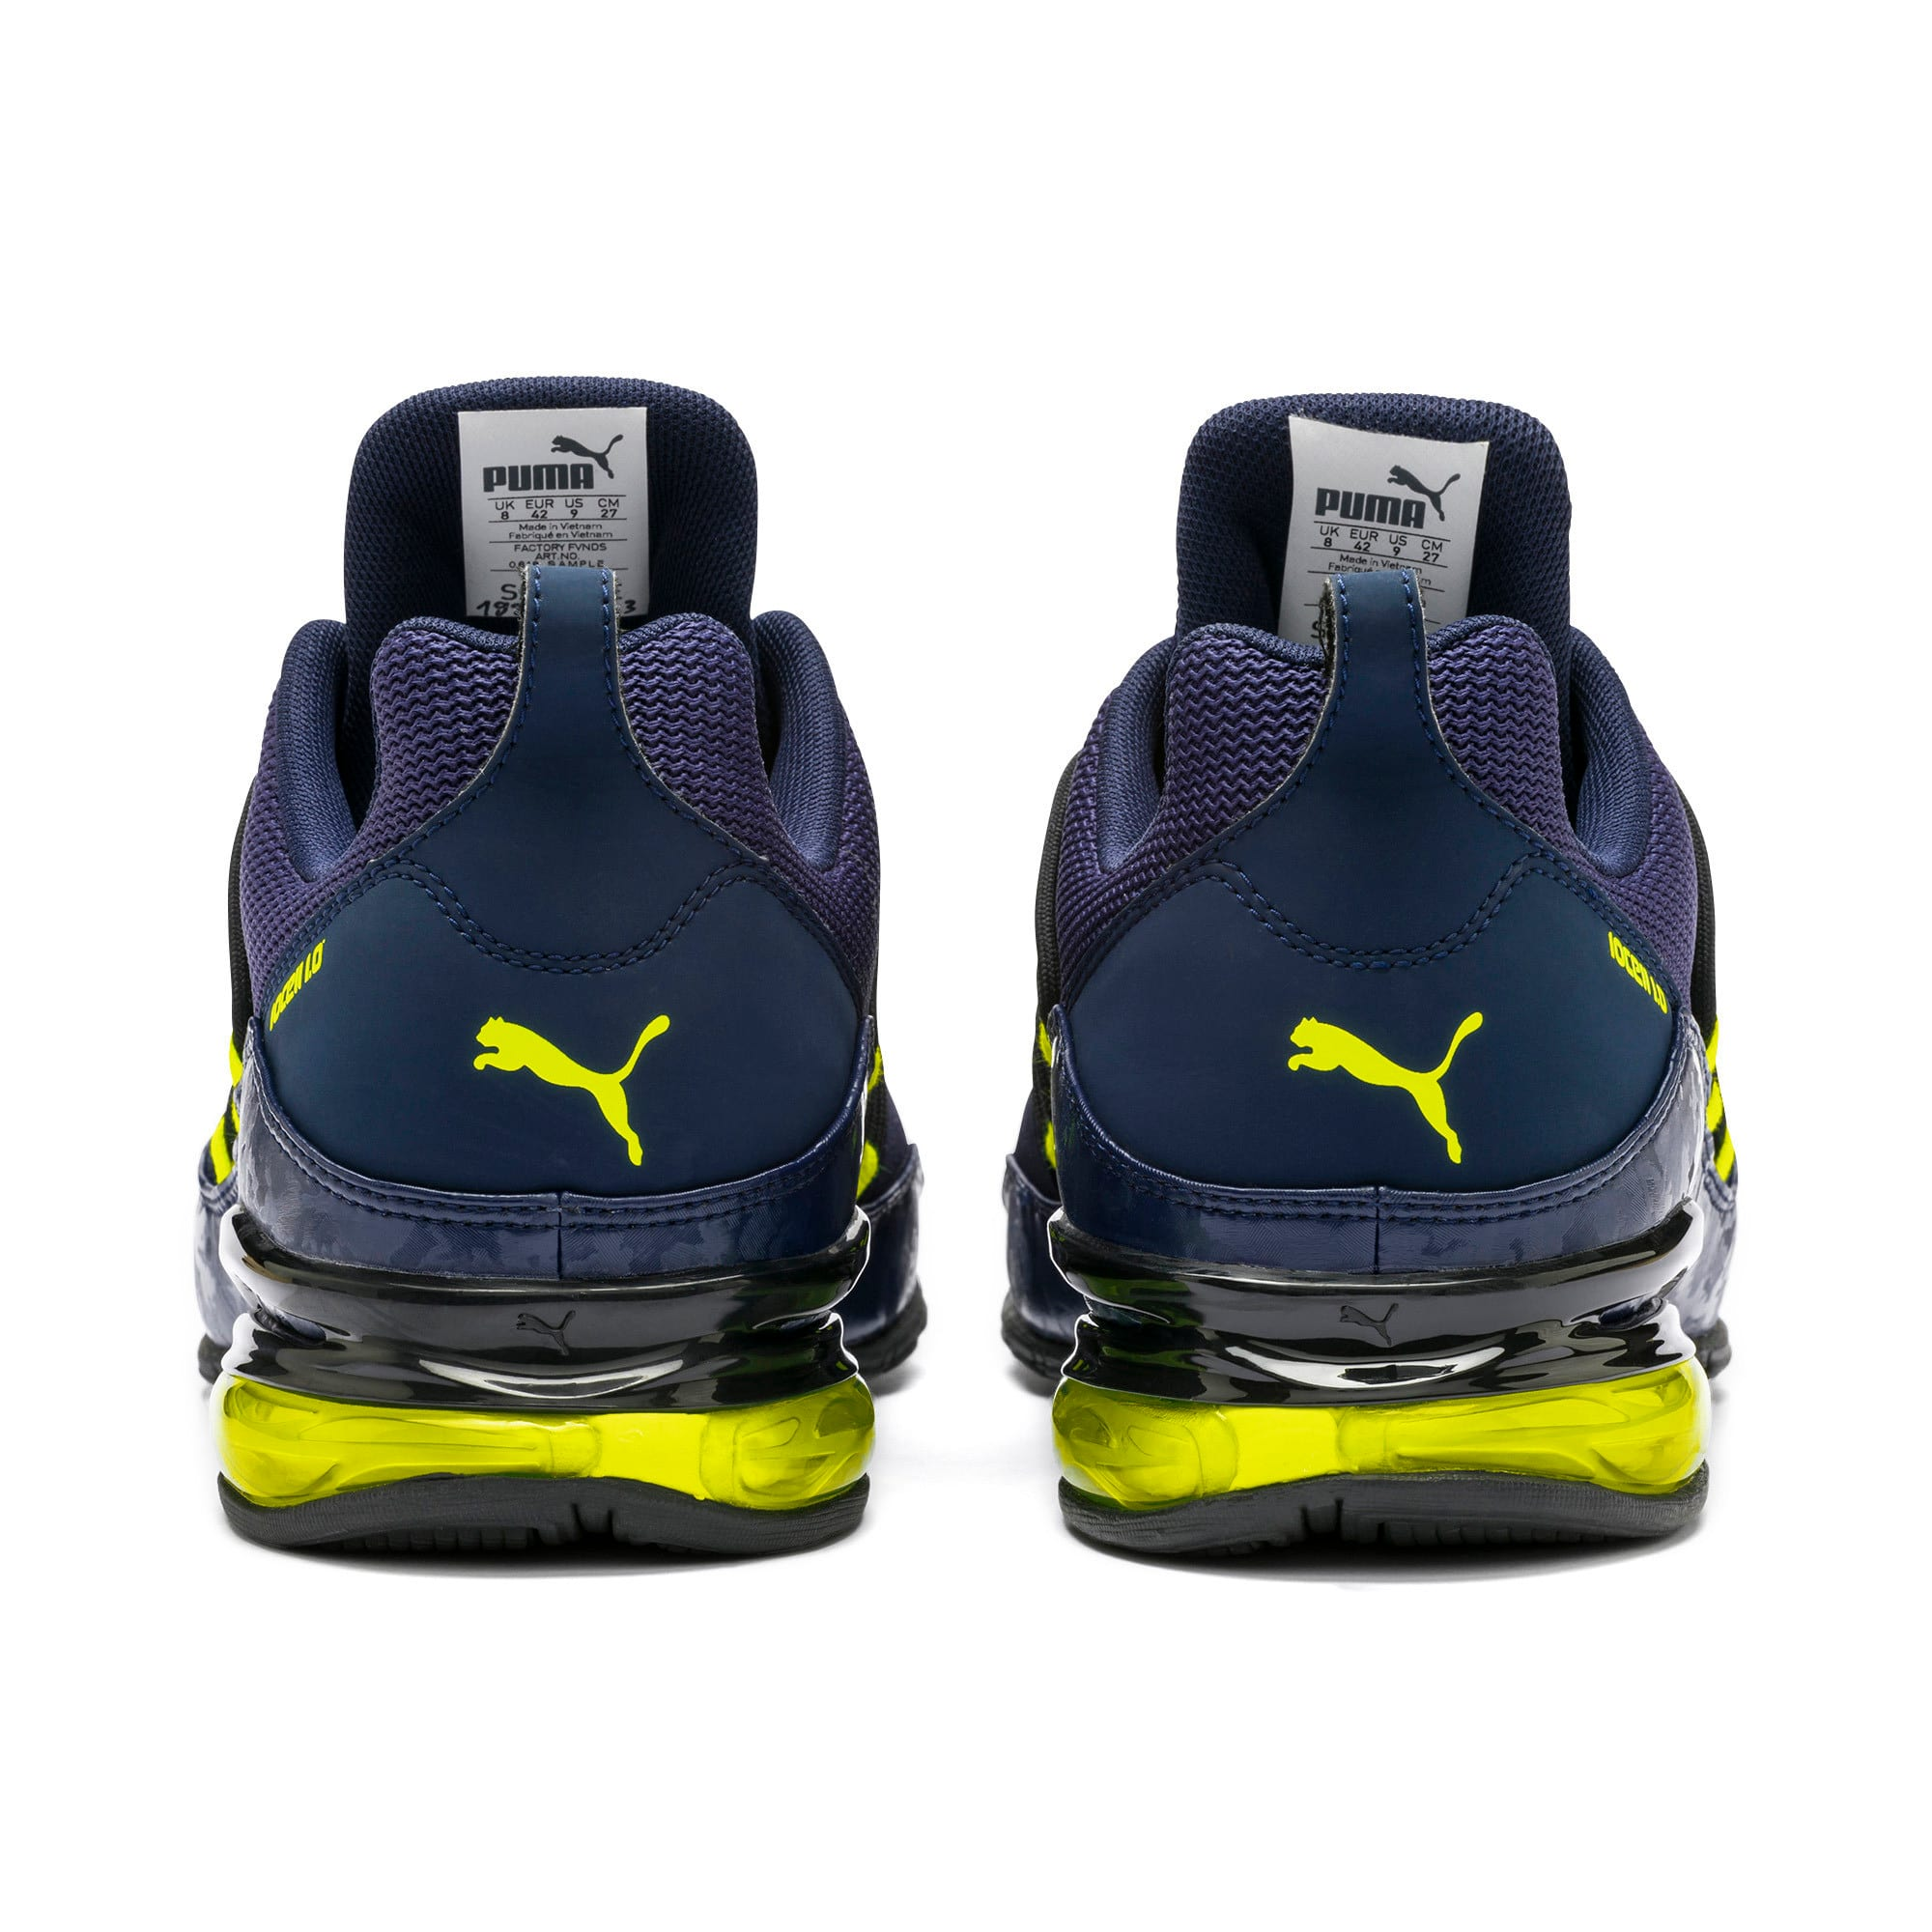 Thumbnail 4 of CELL Regulate Camo Men's Training Shoes, Peacoat-Yellow Alert, medium